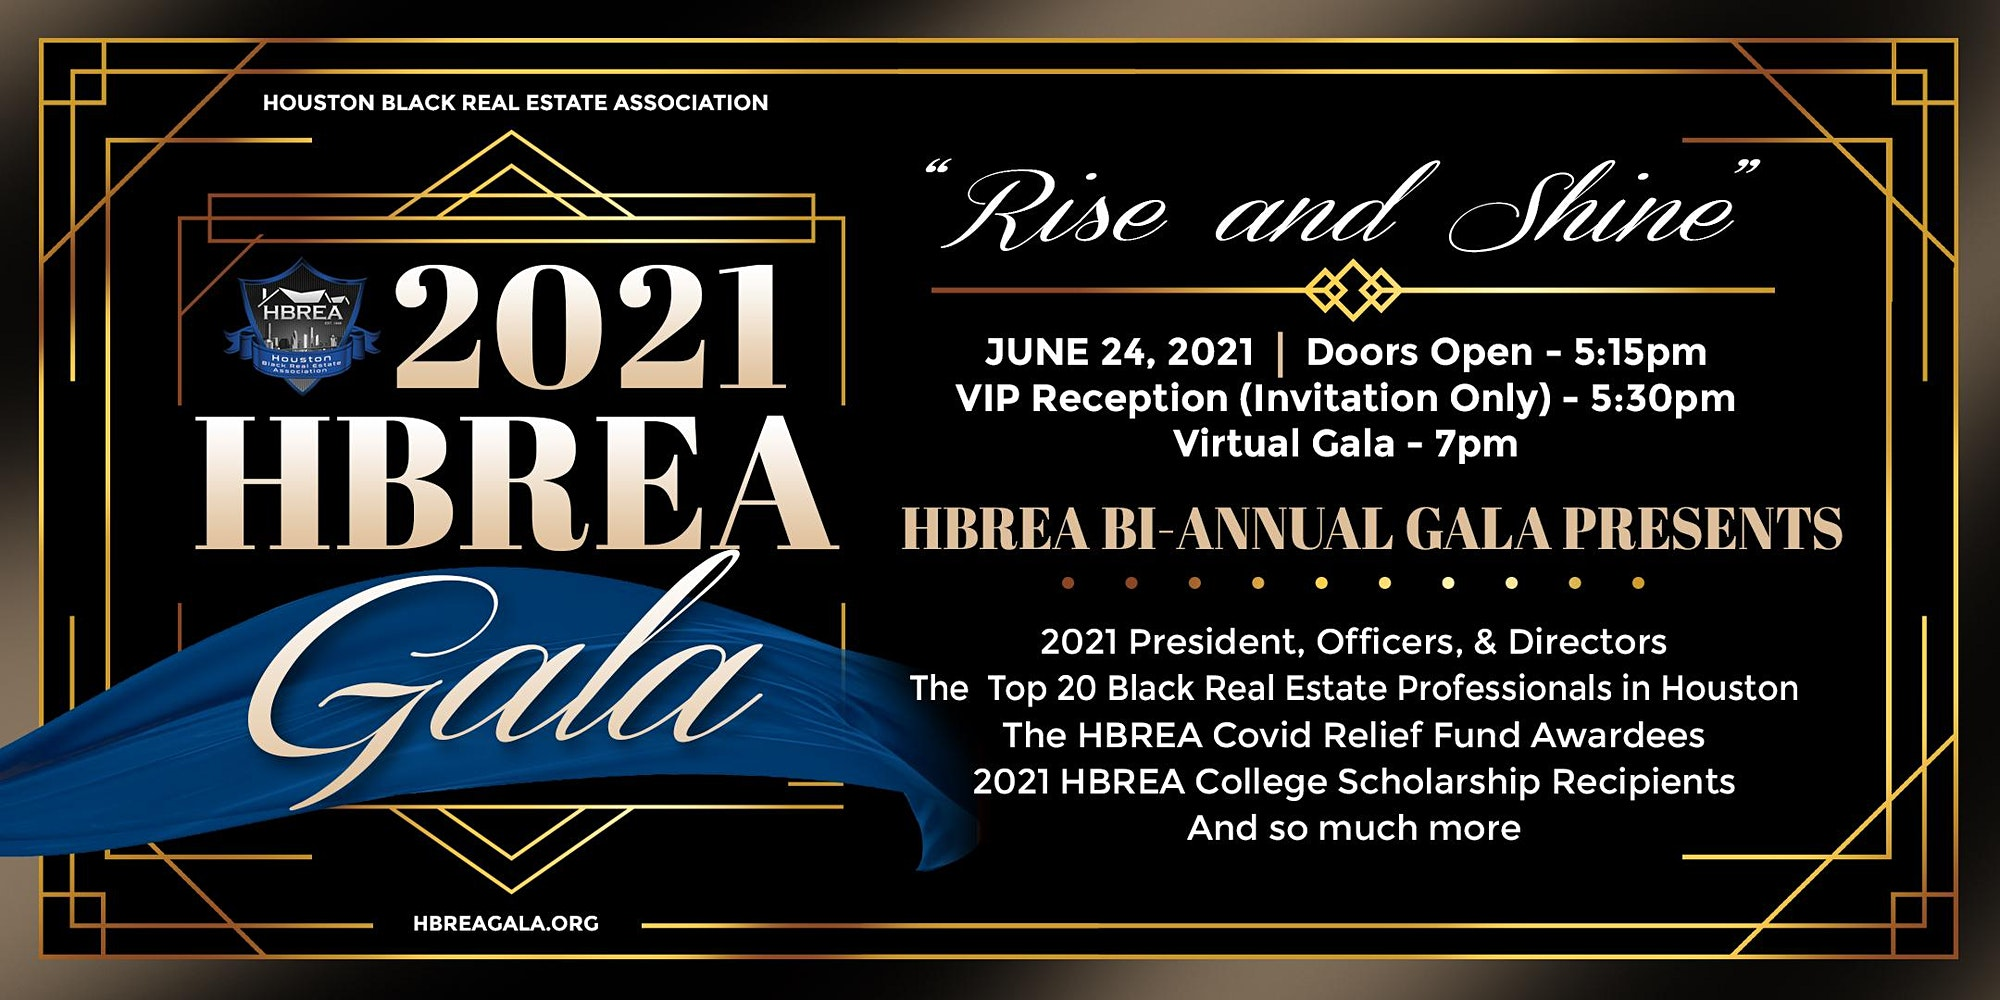 2021 HBREA Gala - Rise & Shine